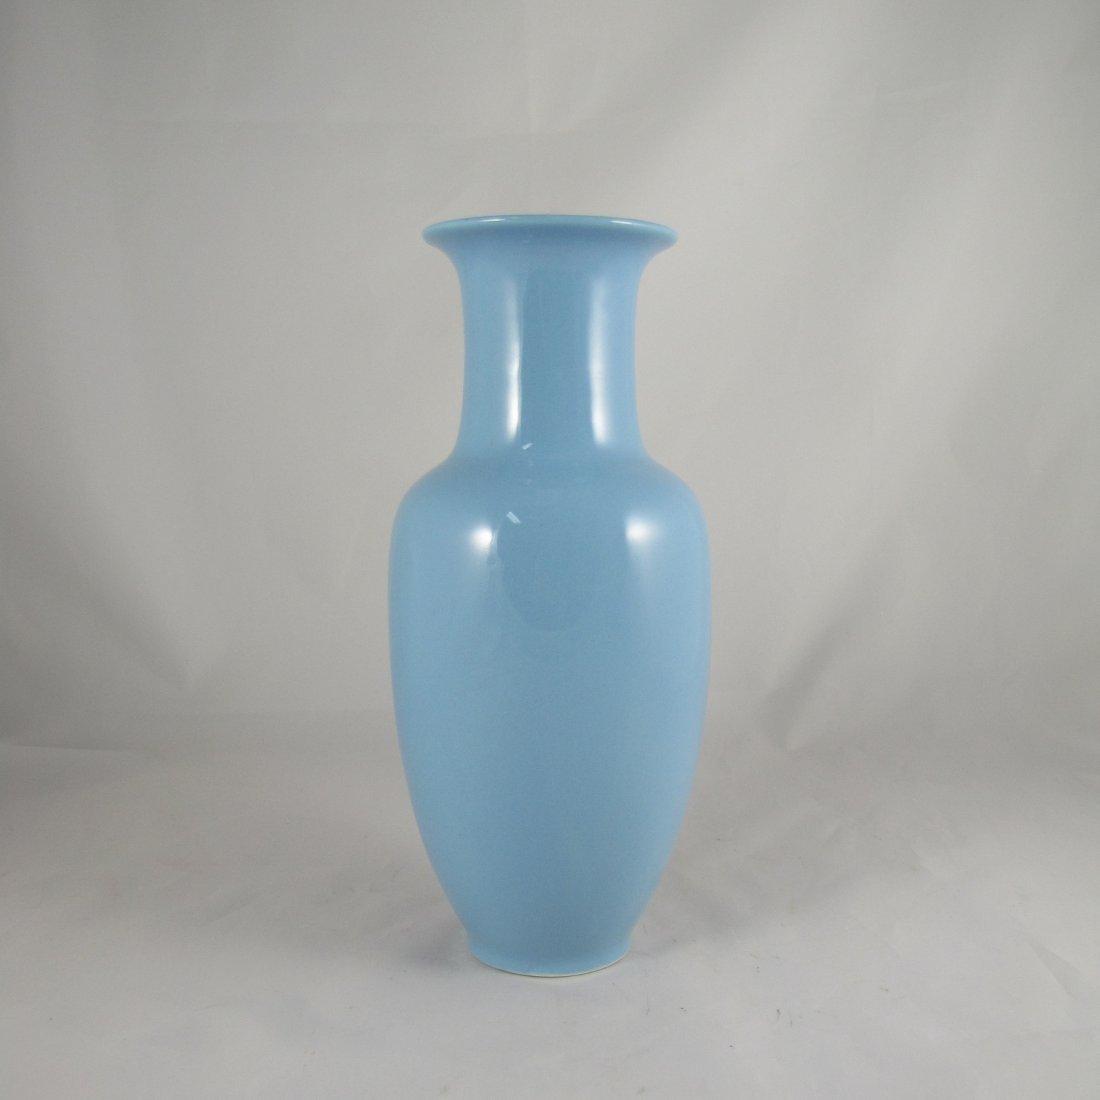 Chinese Monochrome Glazed Vases